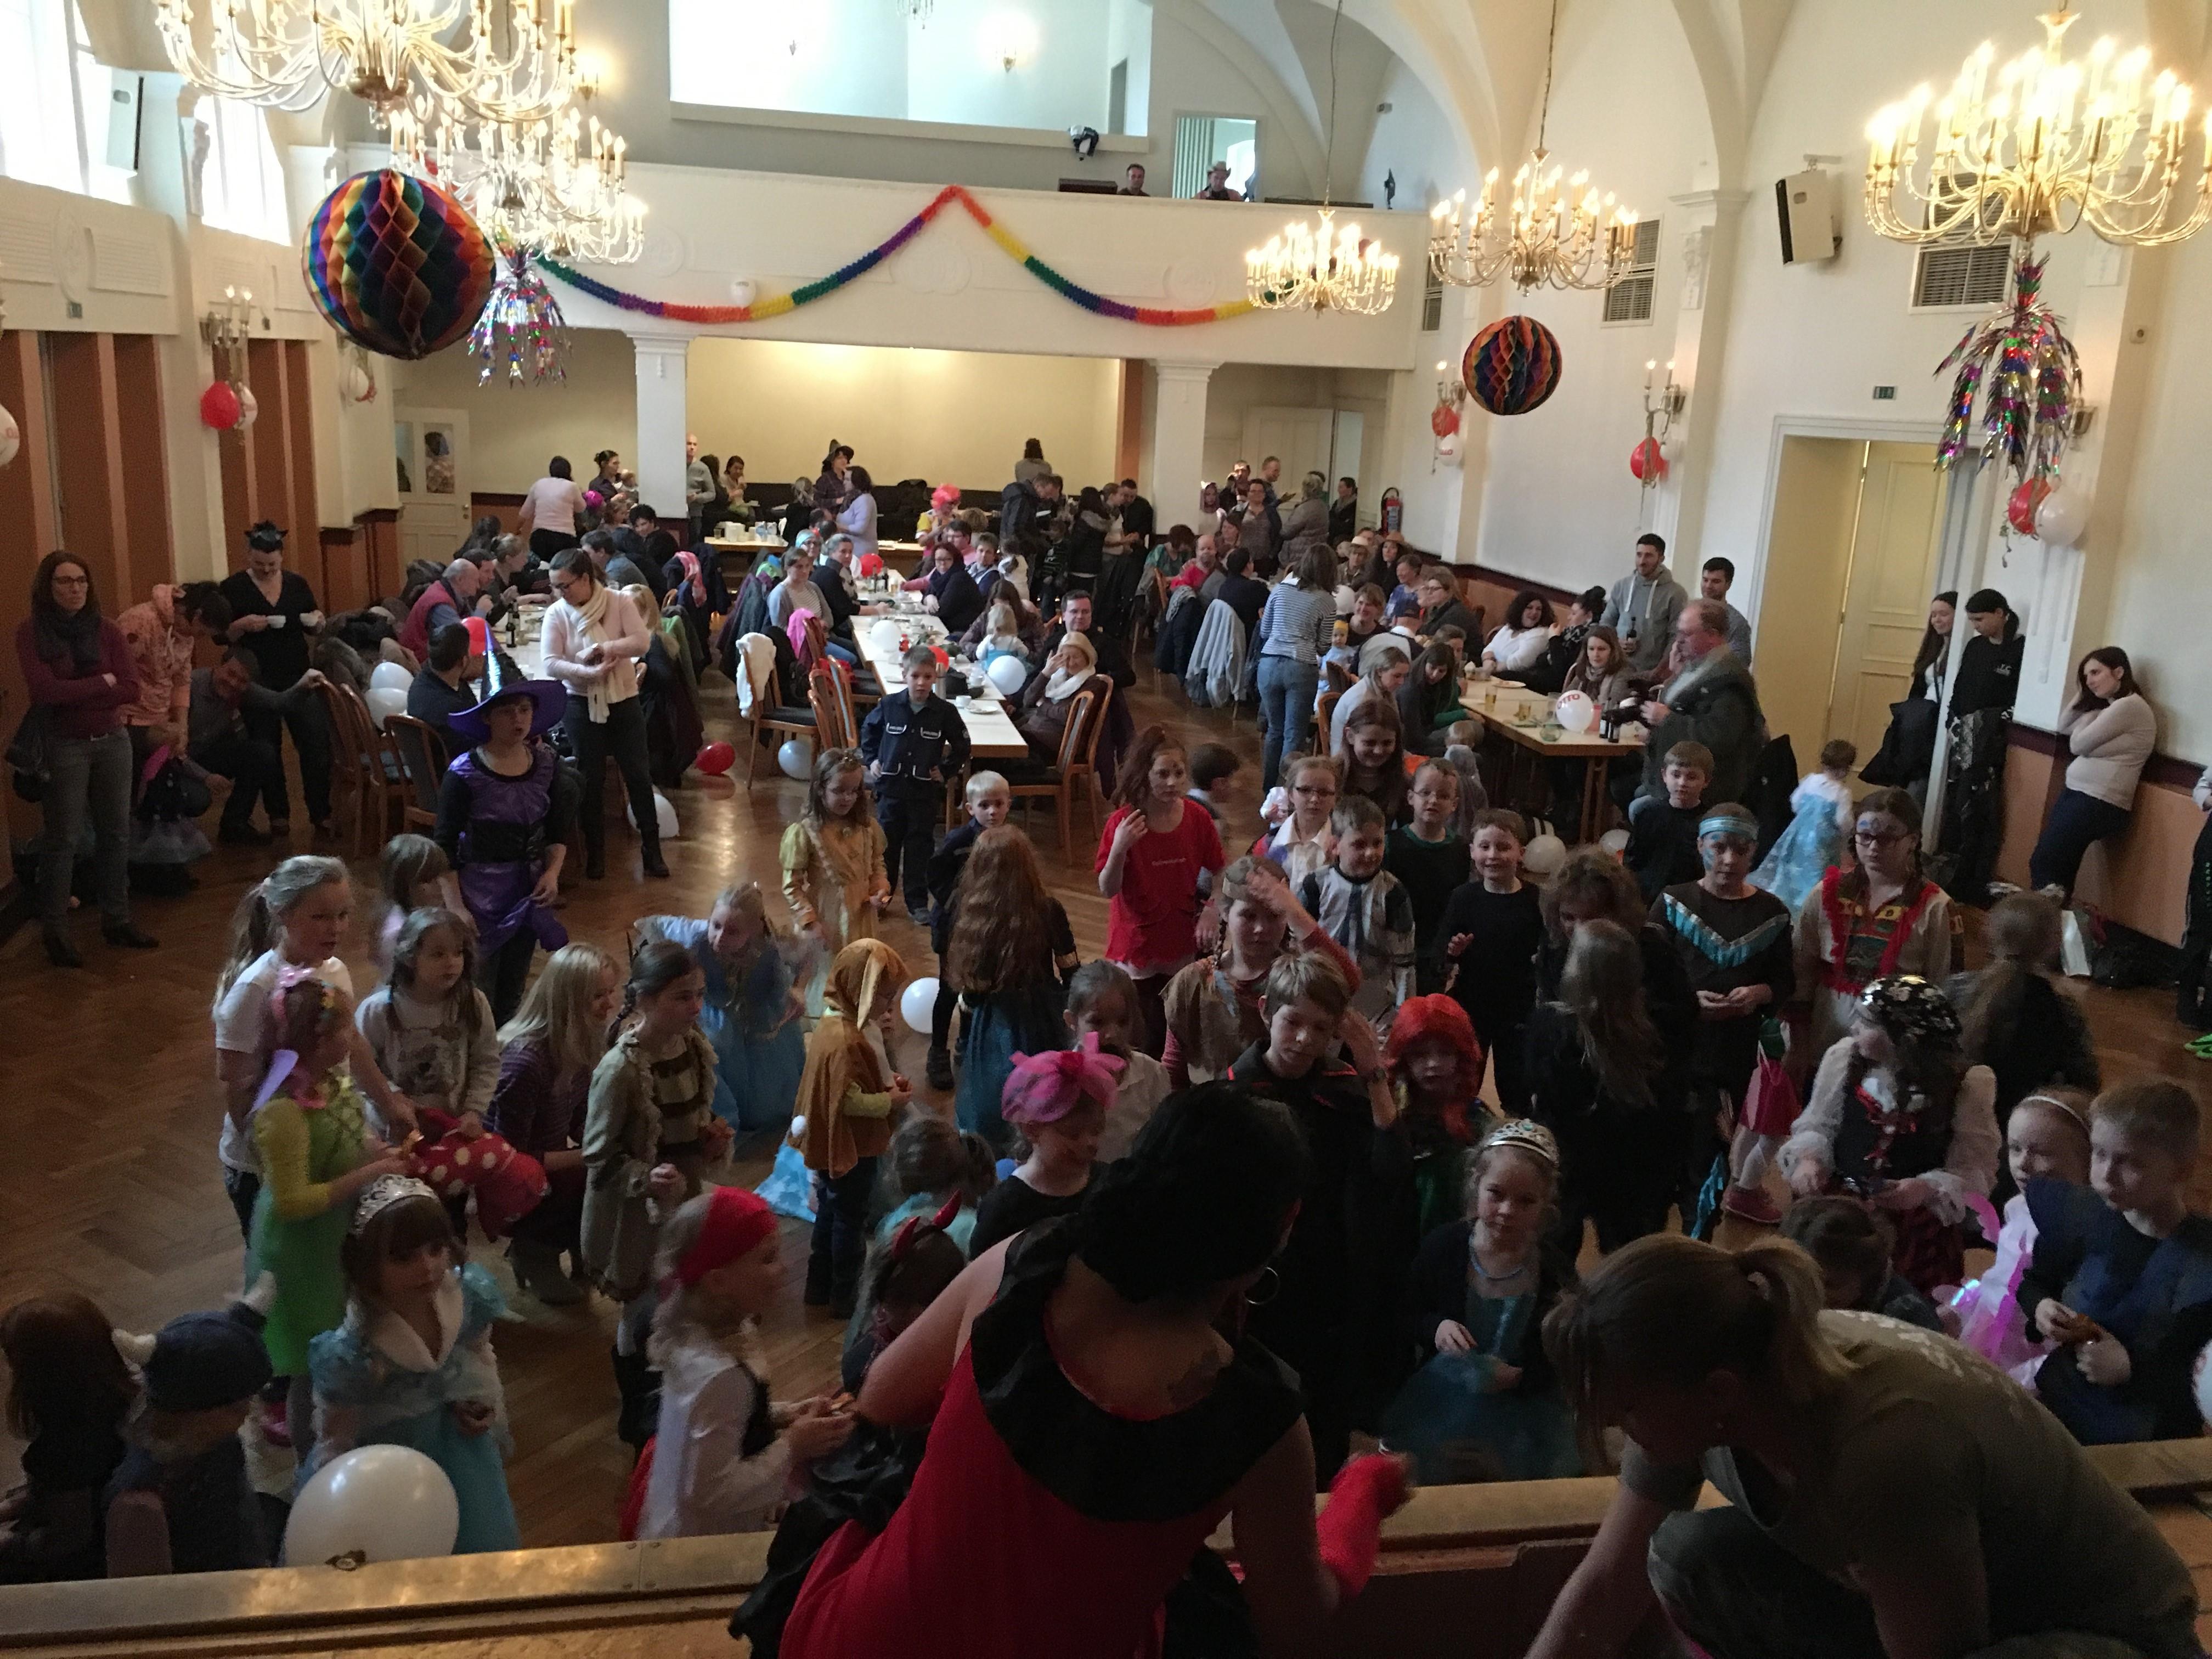 Toller Kinderkarneval im voll besetzten Rathaussaal